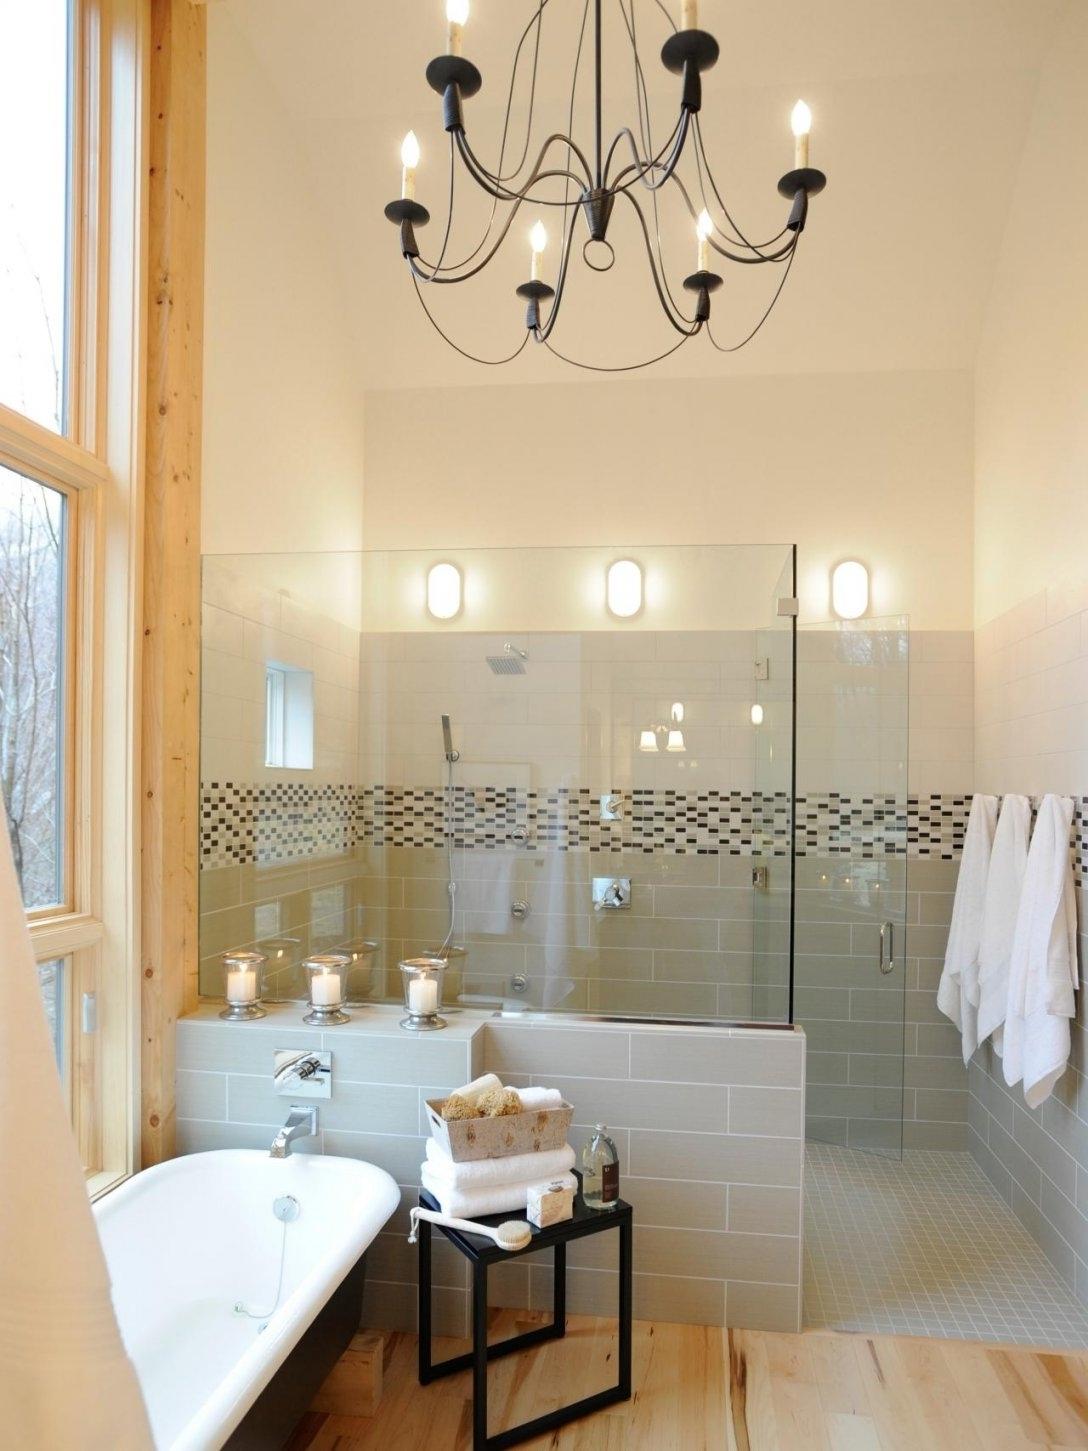 Most Popular Modern Bathroom Chandeliers Ideas : Top Bathroom – Elegance And With Regard To Modern Bathroom Chandeliers (View 11 of 15)